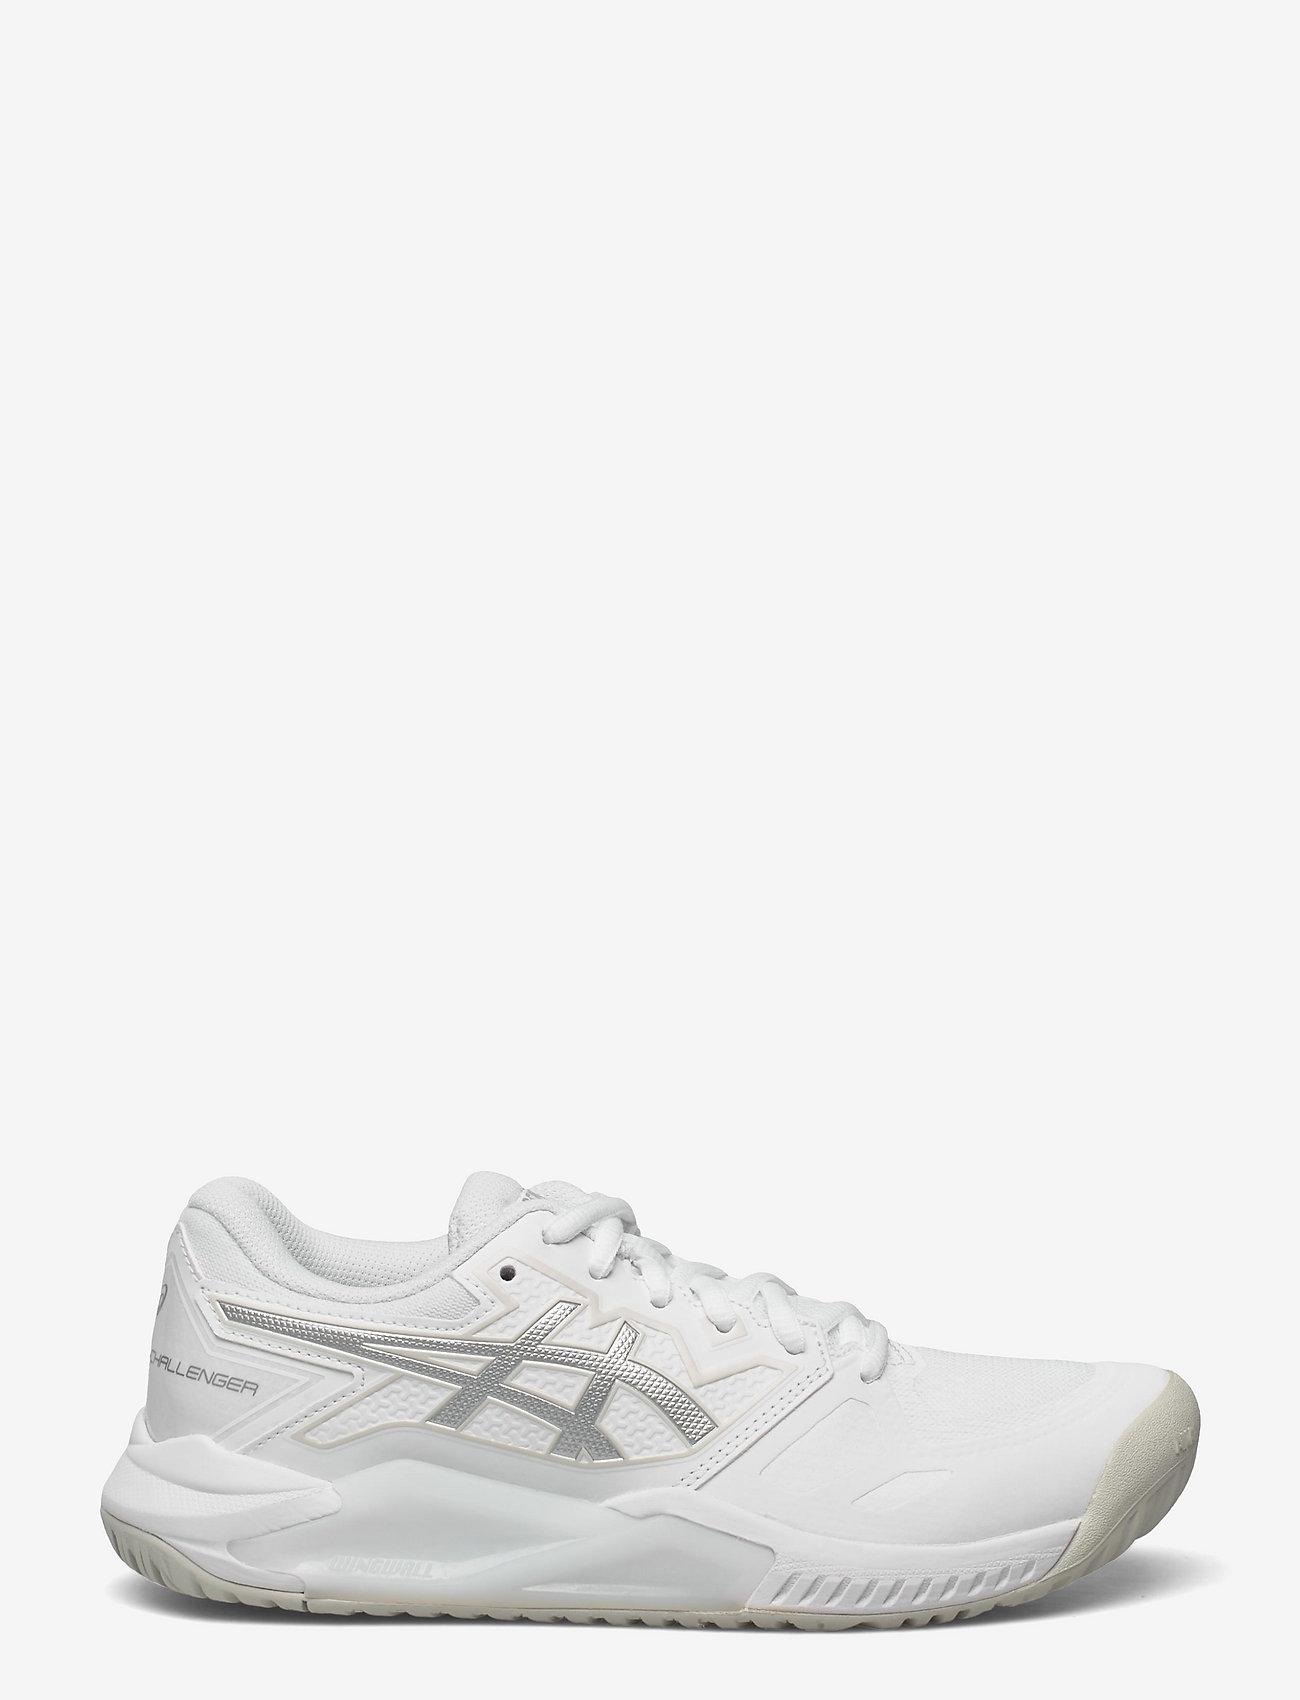 Asics - GEL-CHALLENGER 13 - ketsjersportsko - white/pure silver - 1